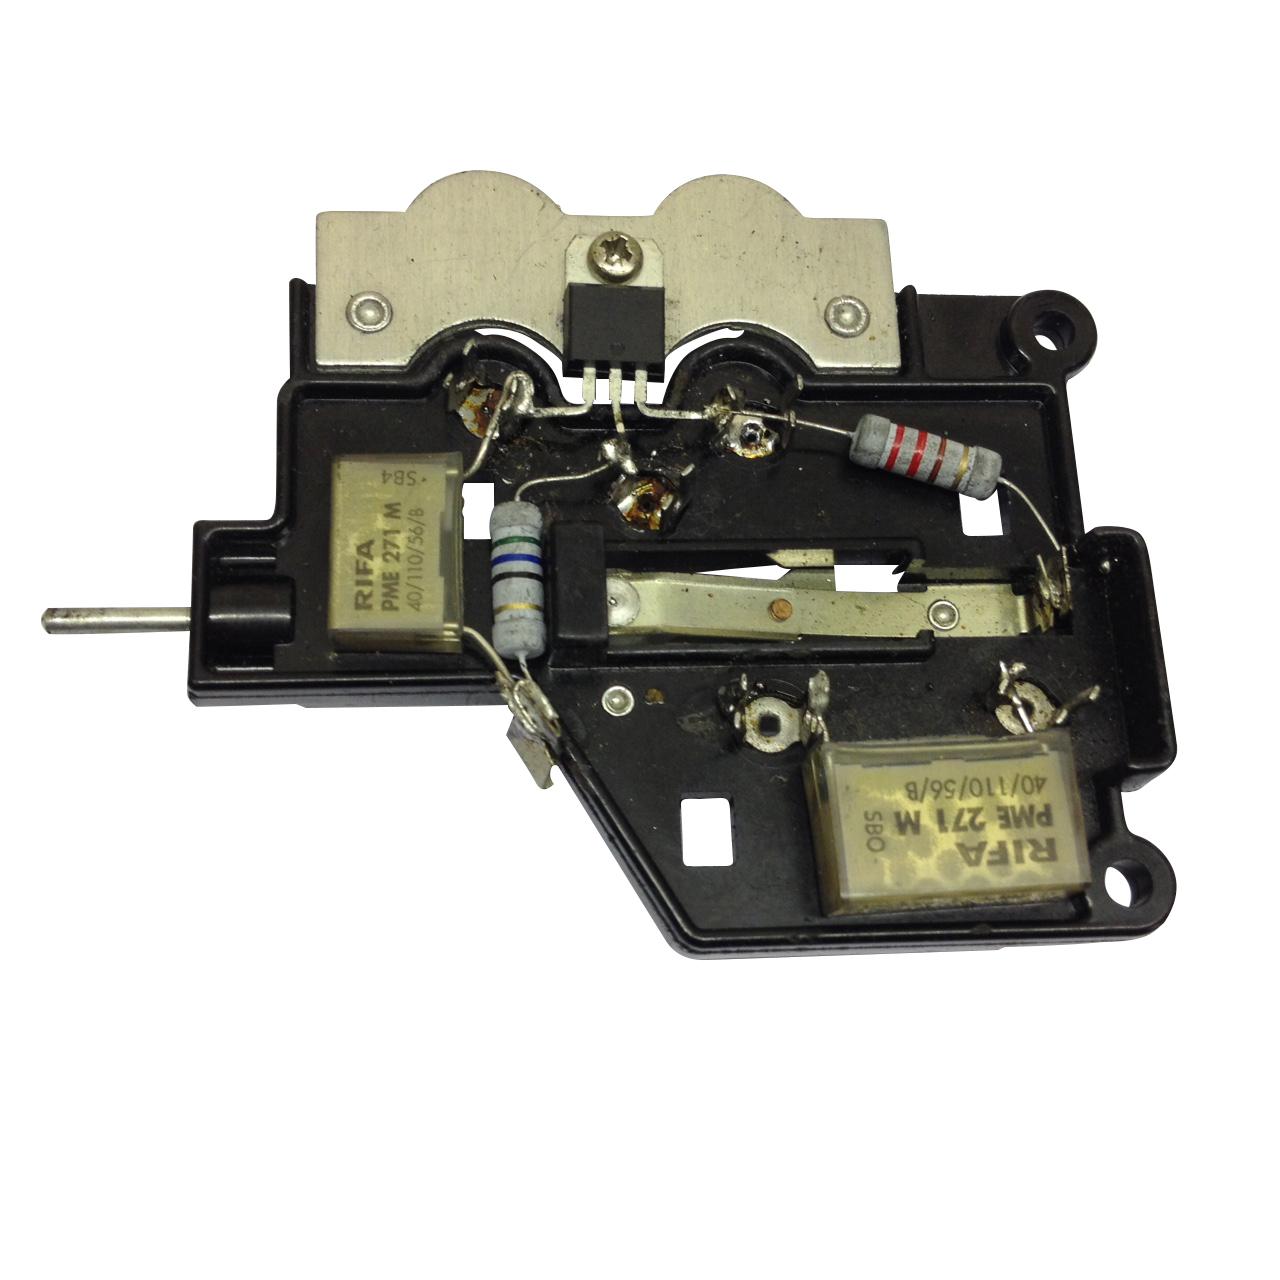 KENWOOD CHEF Amp MAJOR A901 A703 MOTOR CONTROL BOARD